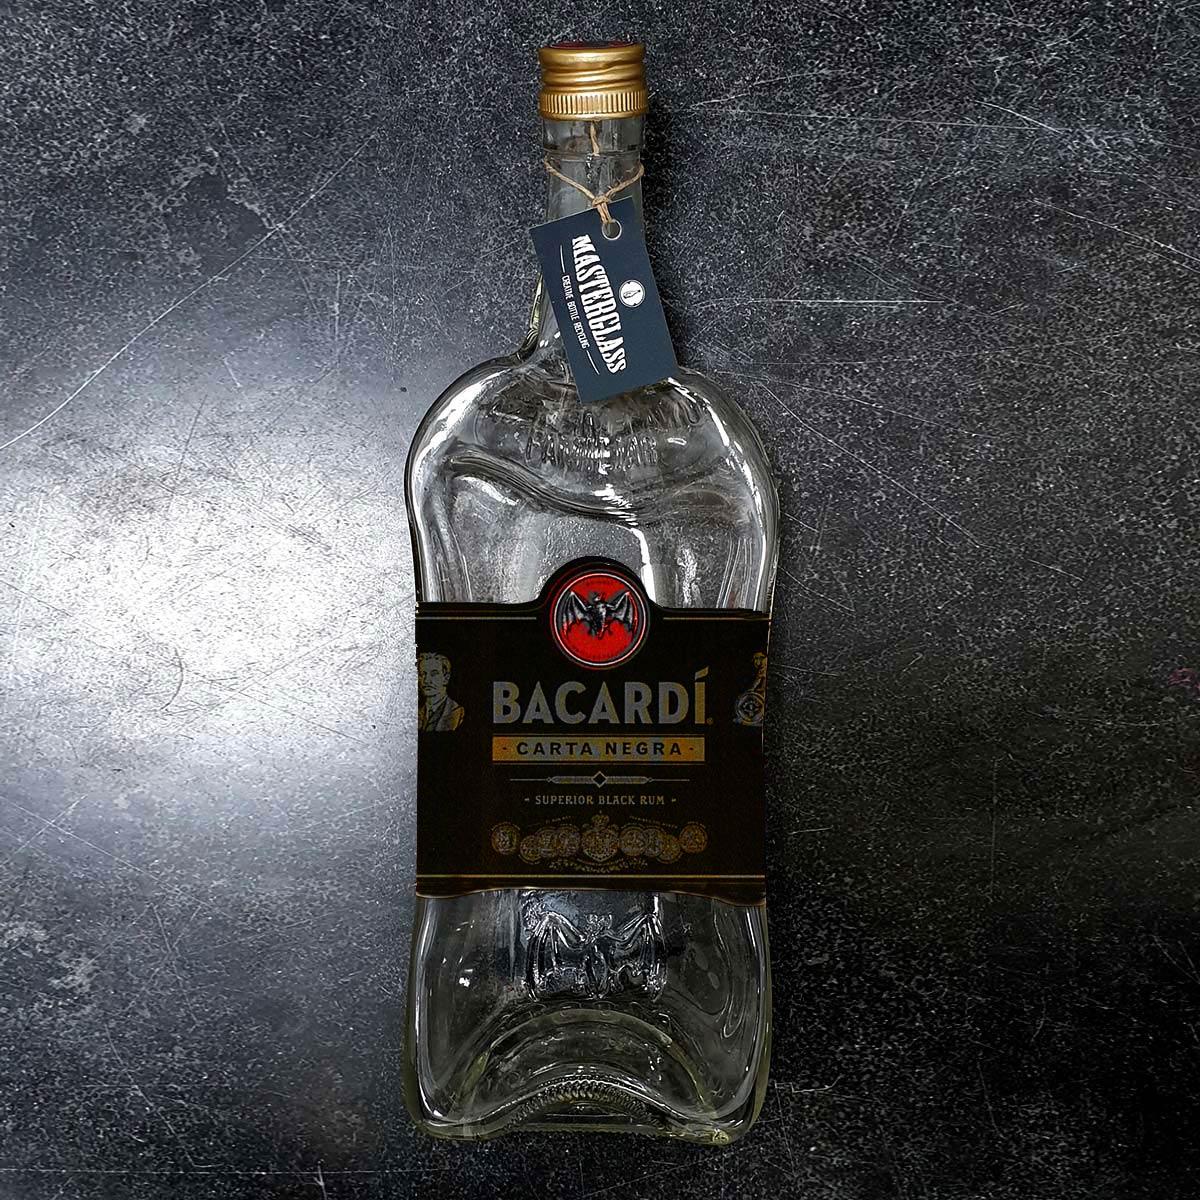 Bacardi-carta-negra